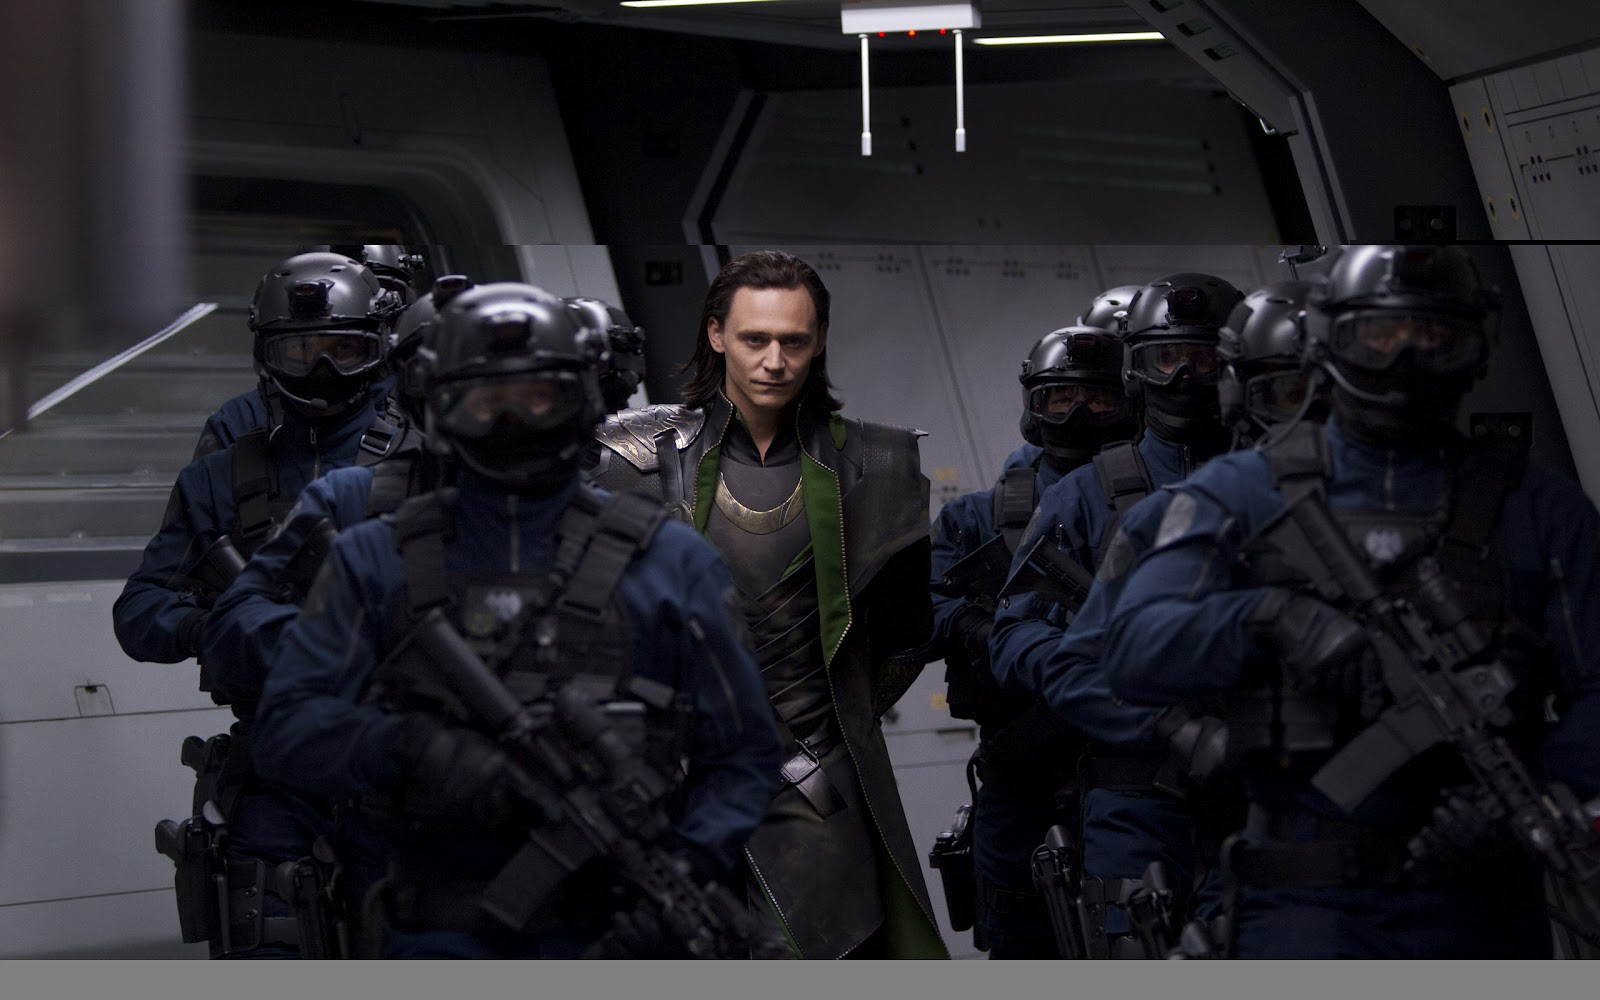 http://1.bp.blogspot.com/--icC3SKUh1Q/T7YkInh6CbI/AAAAAAAAG4s/6ujhuAh0mZo/s1600/The+Avengers+2012+HD+Wallpapers+2560x1600.jpg